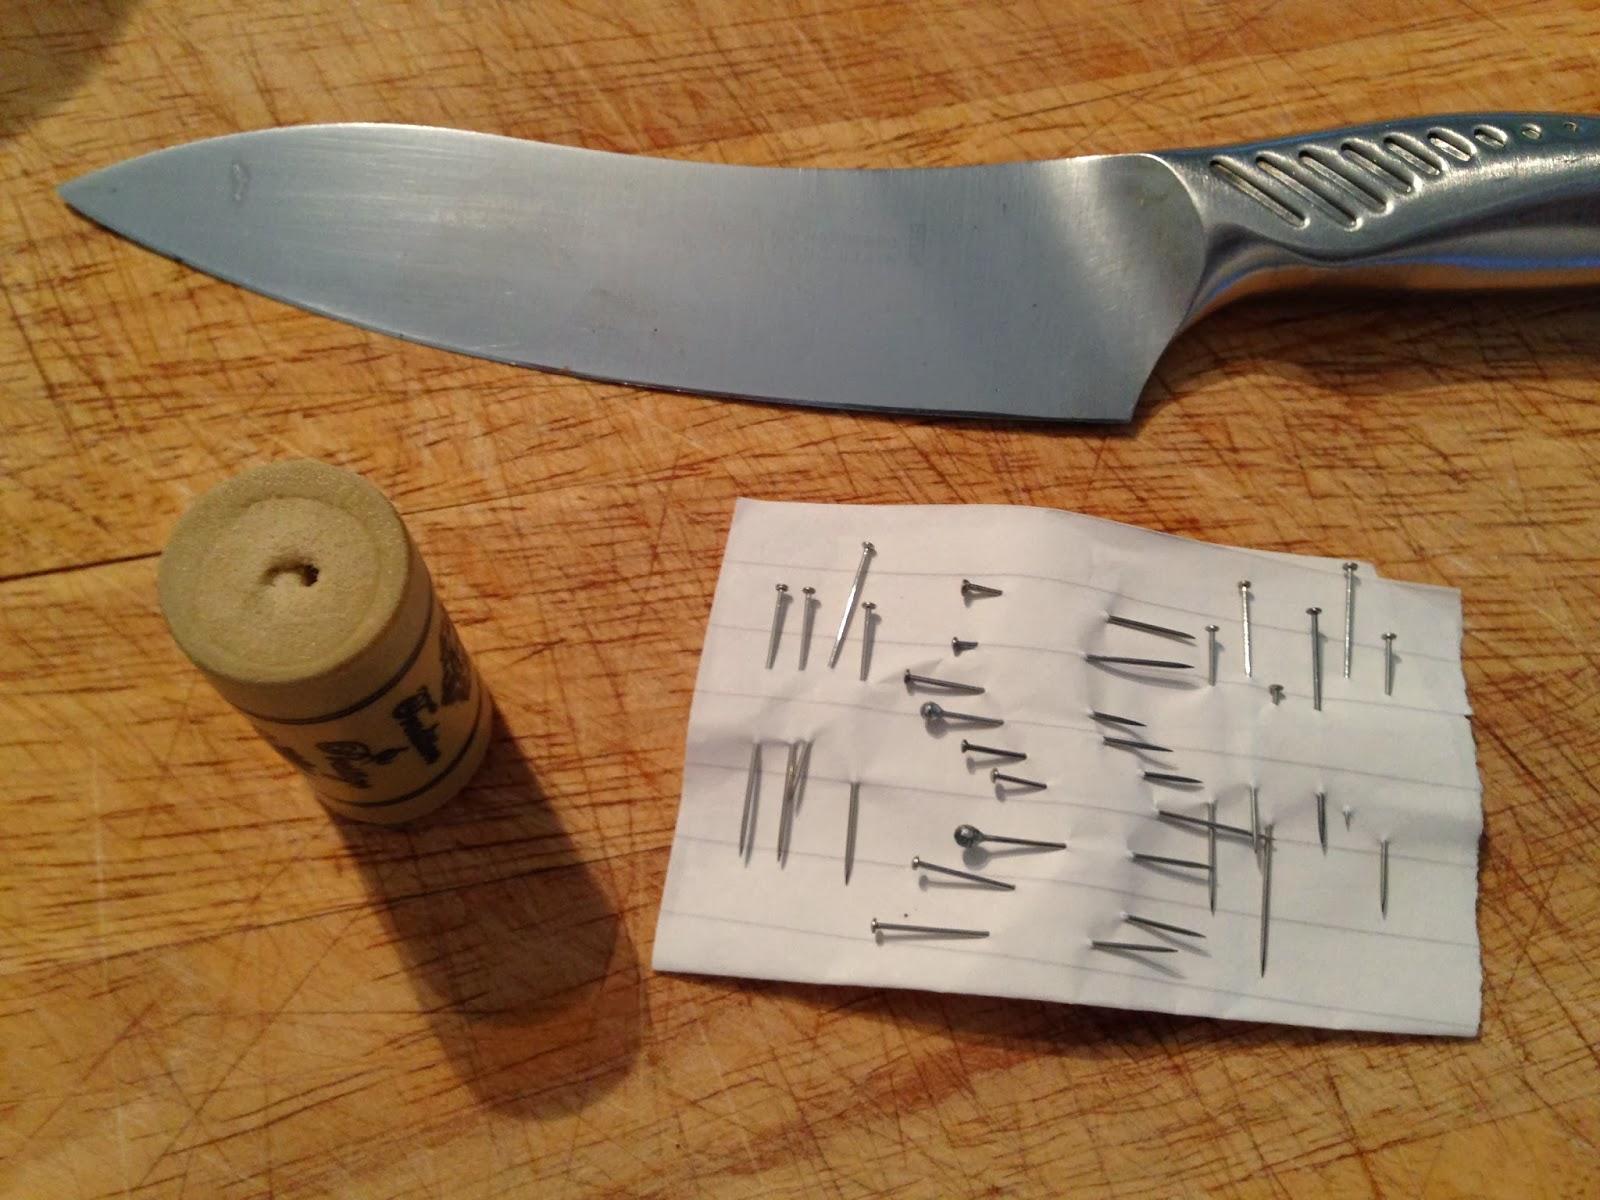 Sloe Pricking Device - Ingredients